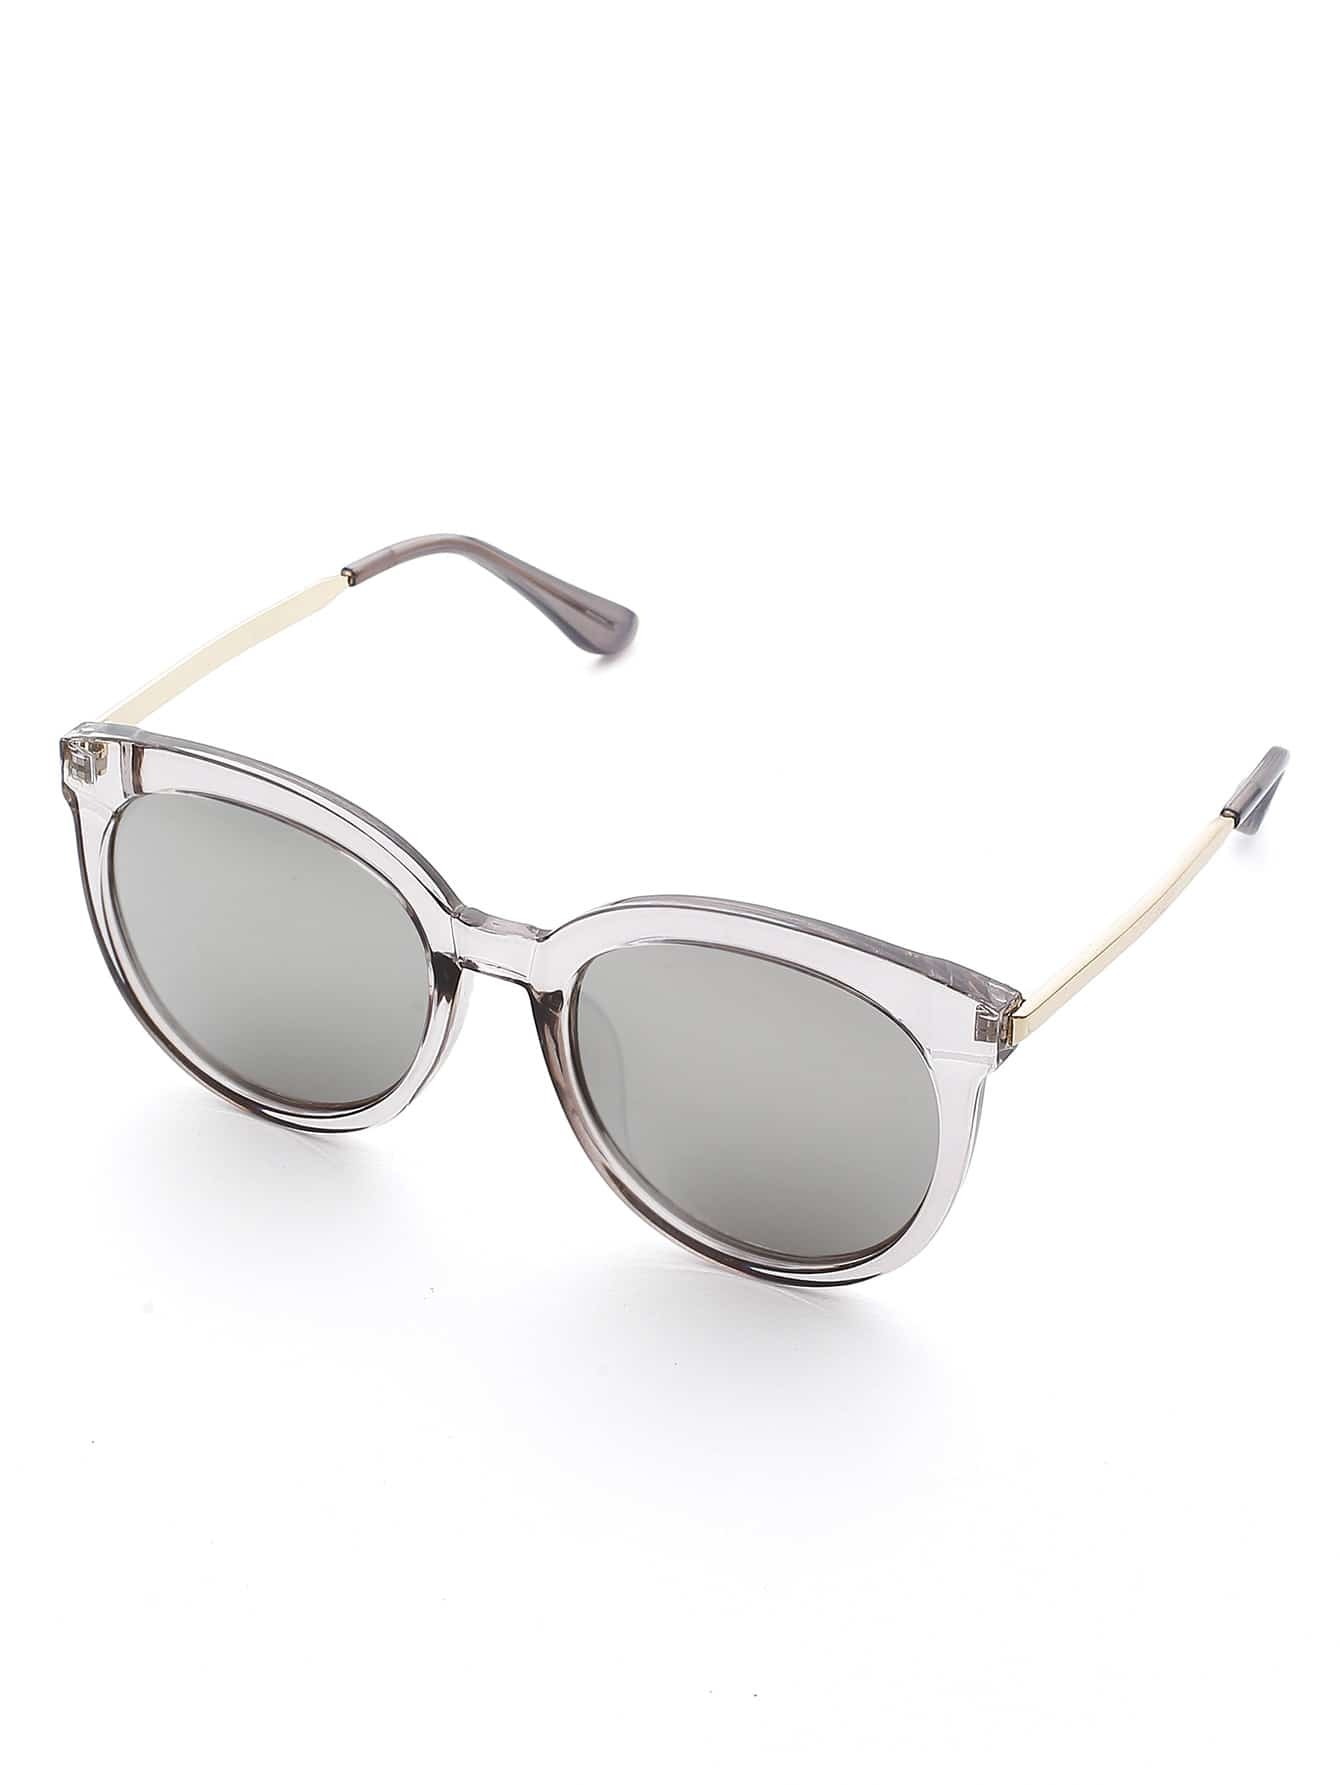 lunettes de soleil lentille ronde cadre clair french romwe. Black Bedroom Furniture Sets. Home Design Ideas